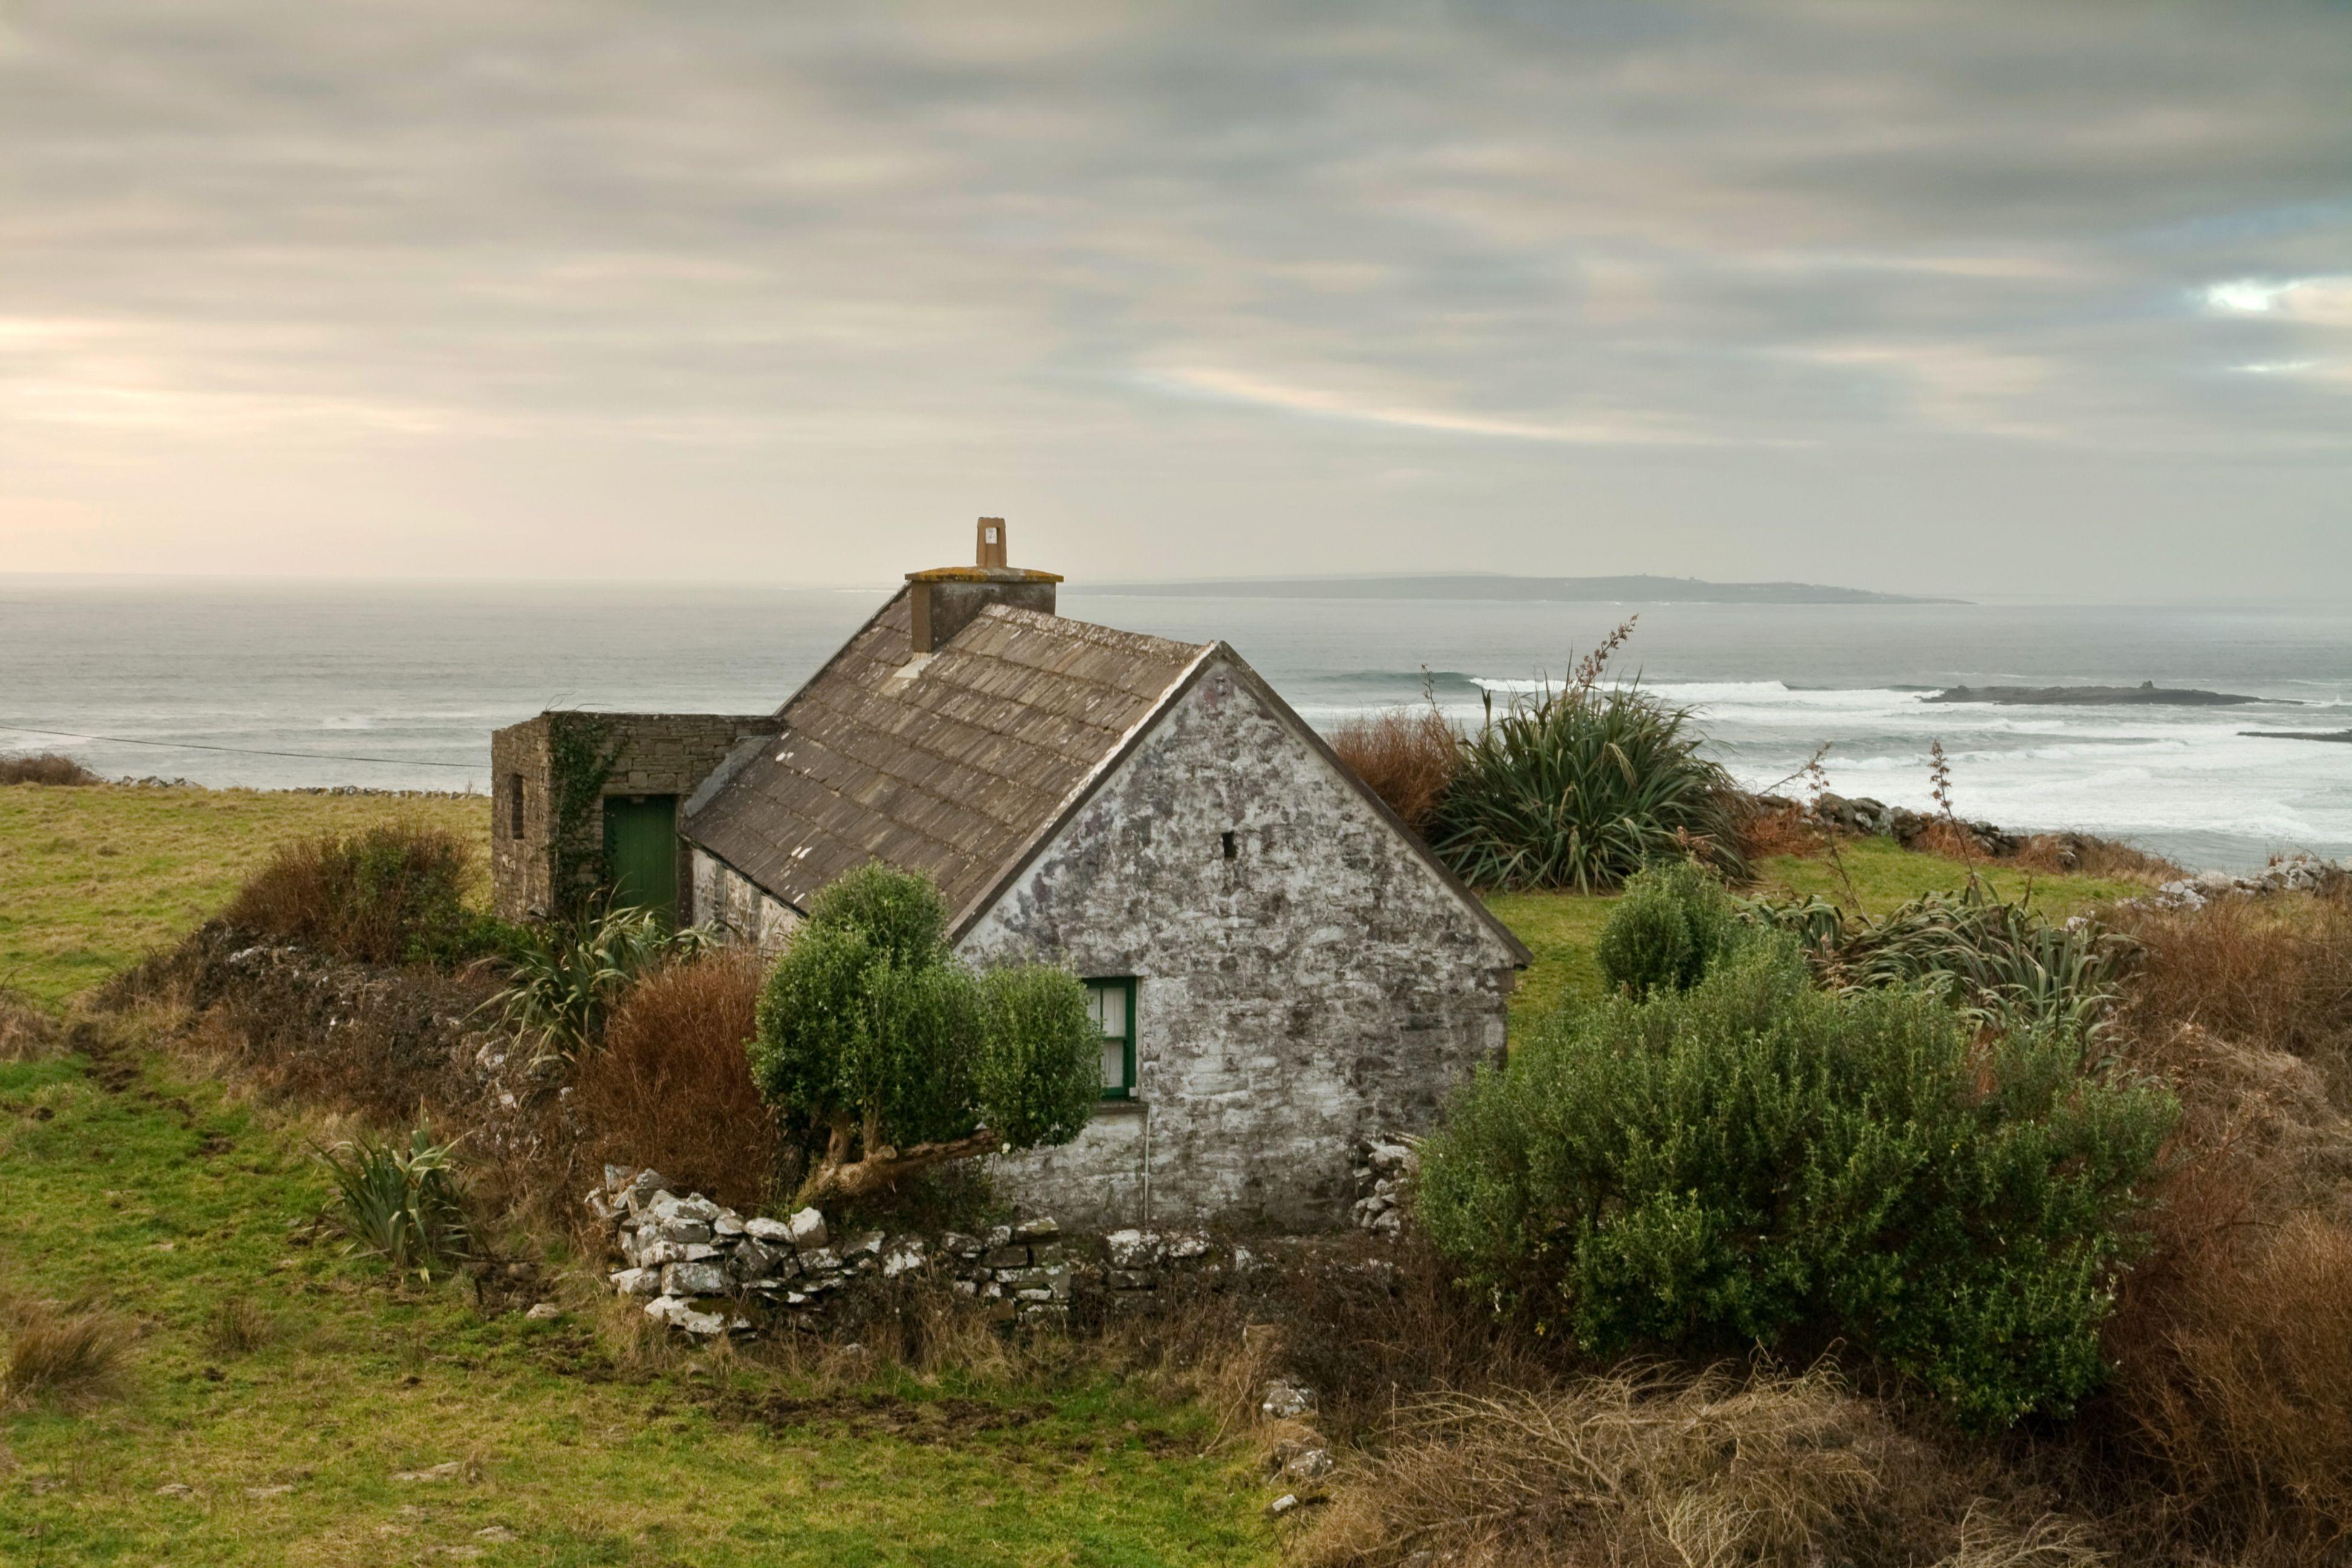 Pin by melinnie angela on Countryside Irish houses